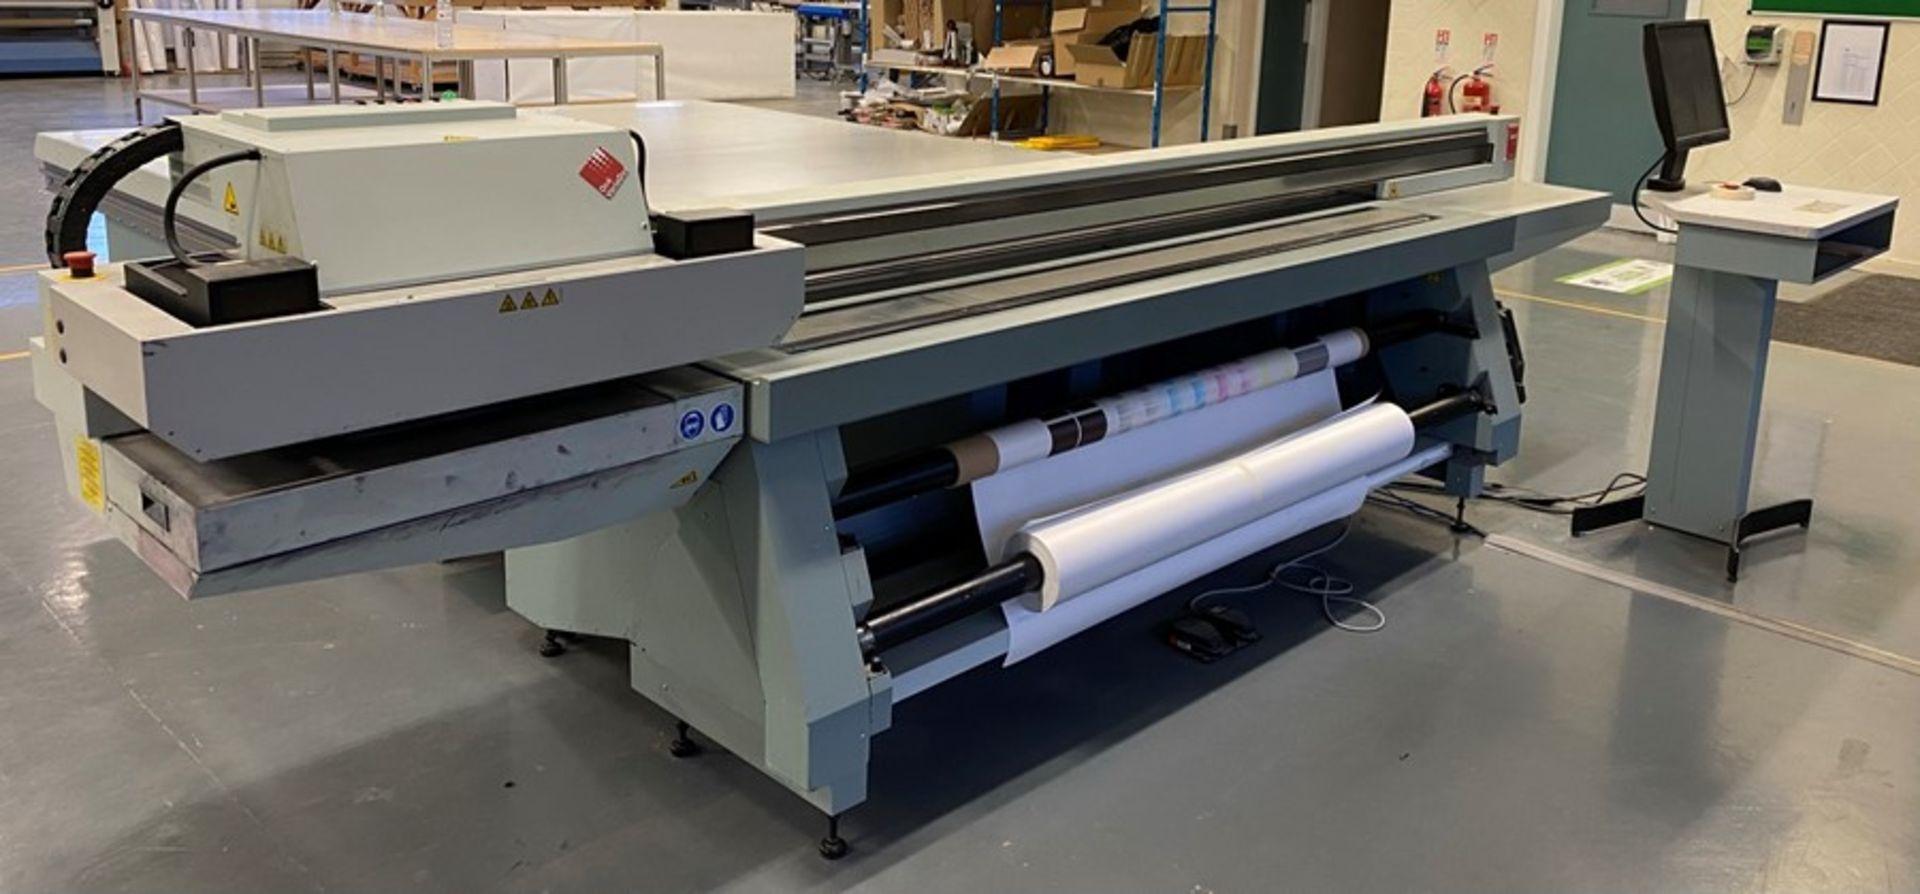 Oce Arizona 550XT + WIO UV flatbed printer (2013) - Image 20 of 22